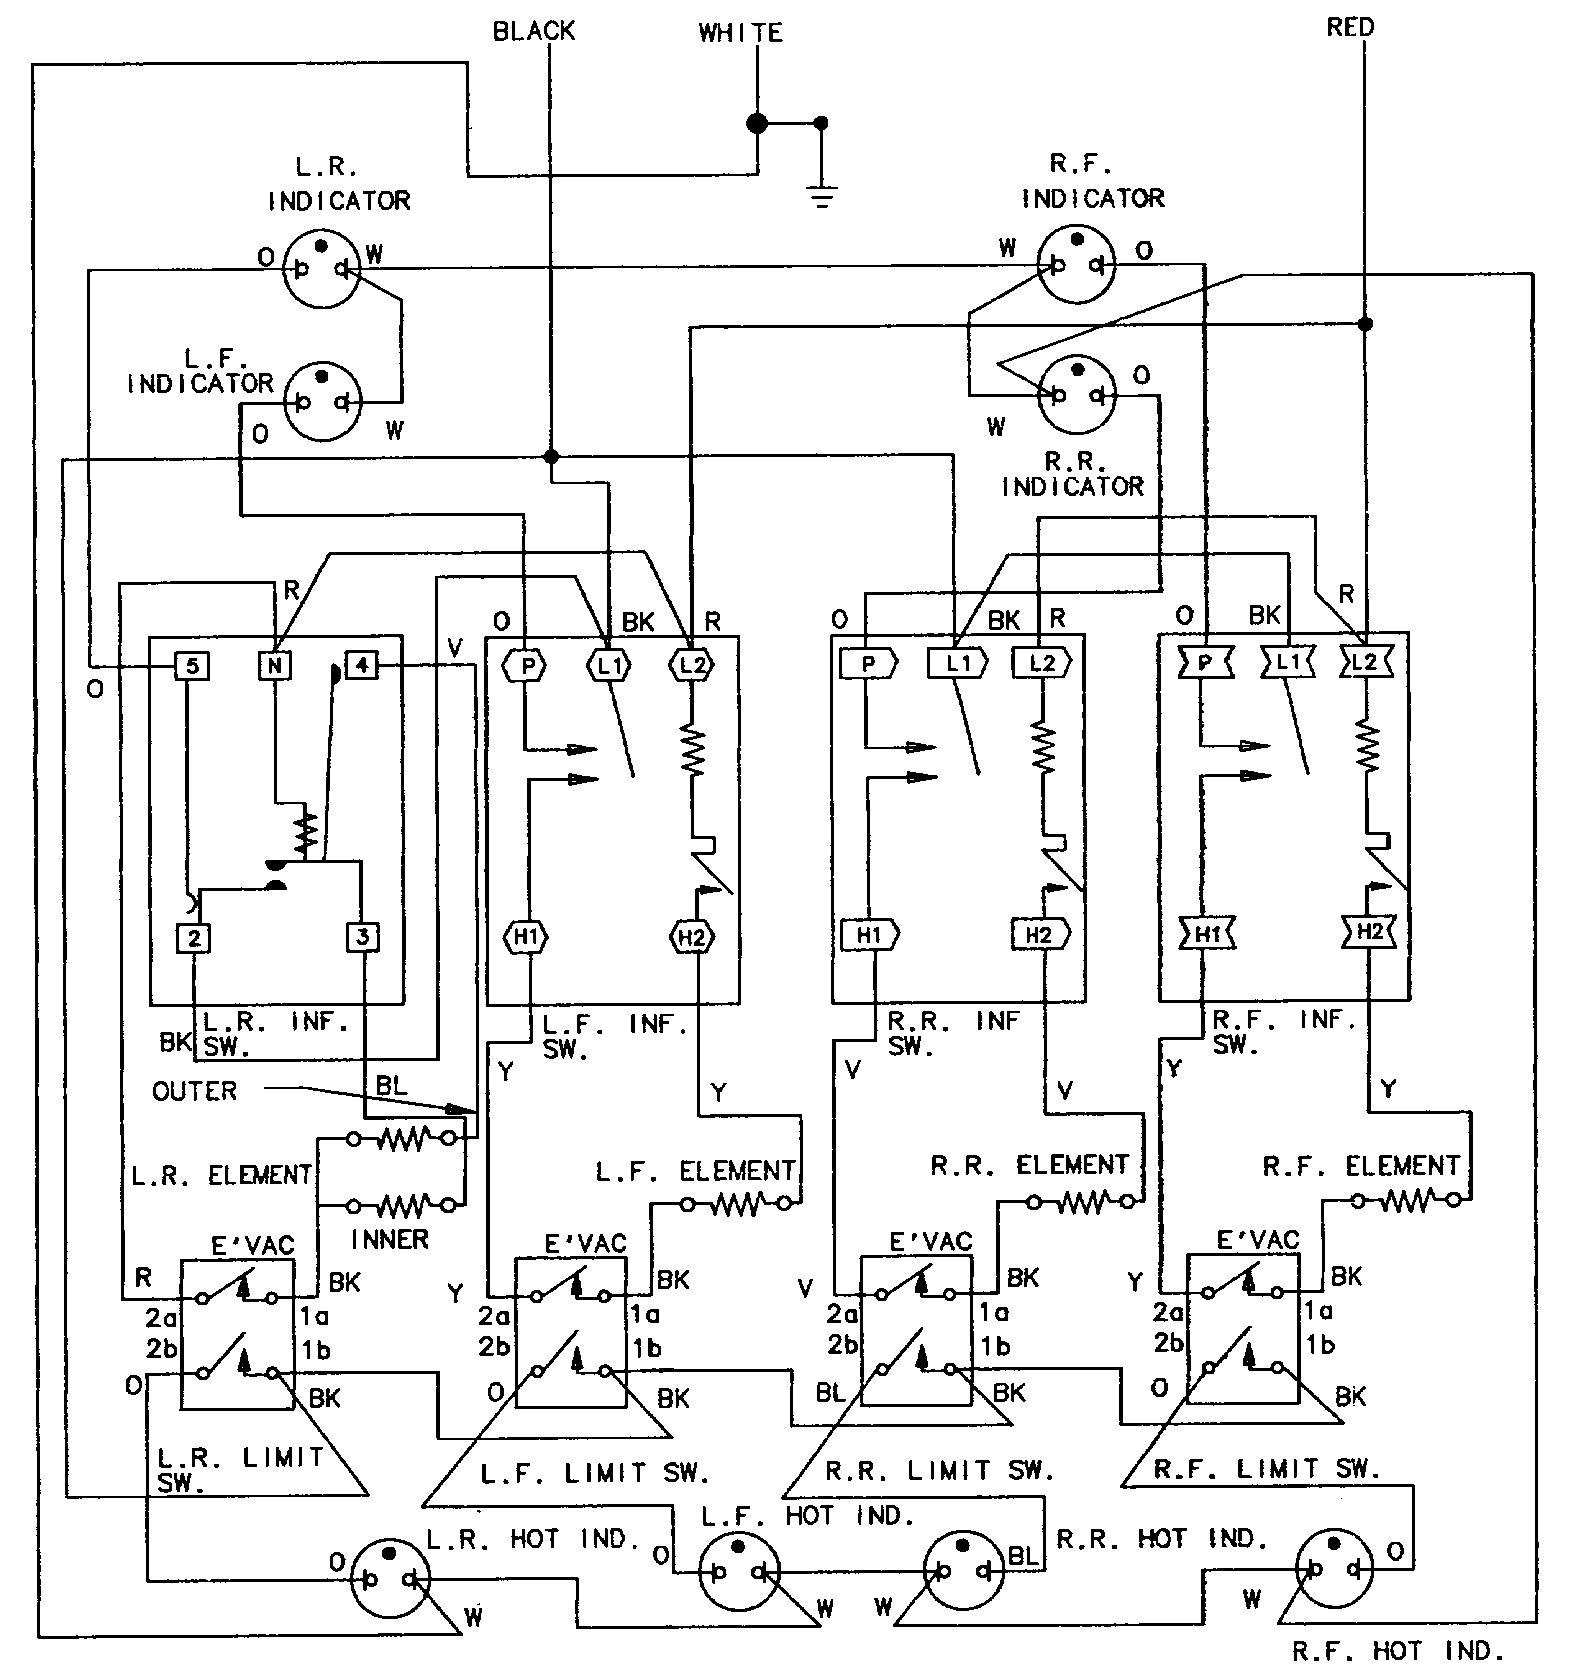 OT_5795] Wiring Diagram For Jenn Air Cooktop Schematic WiringAtota Over Atolo Rosz Epsy Pap Mohammedshrine Librar Wiring 101